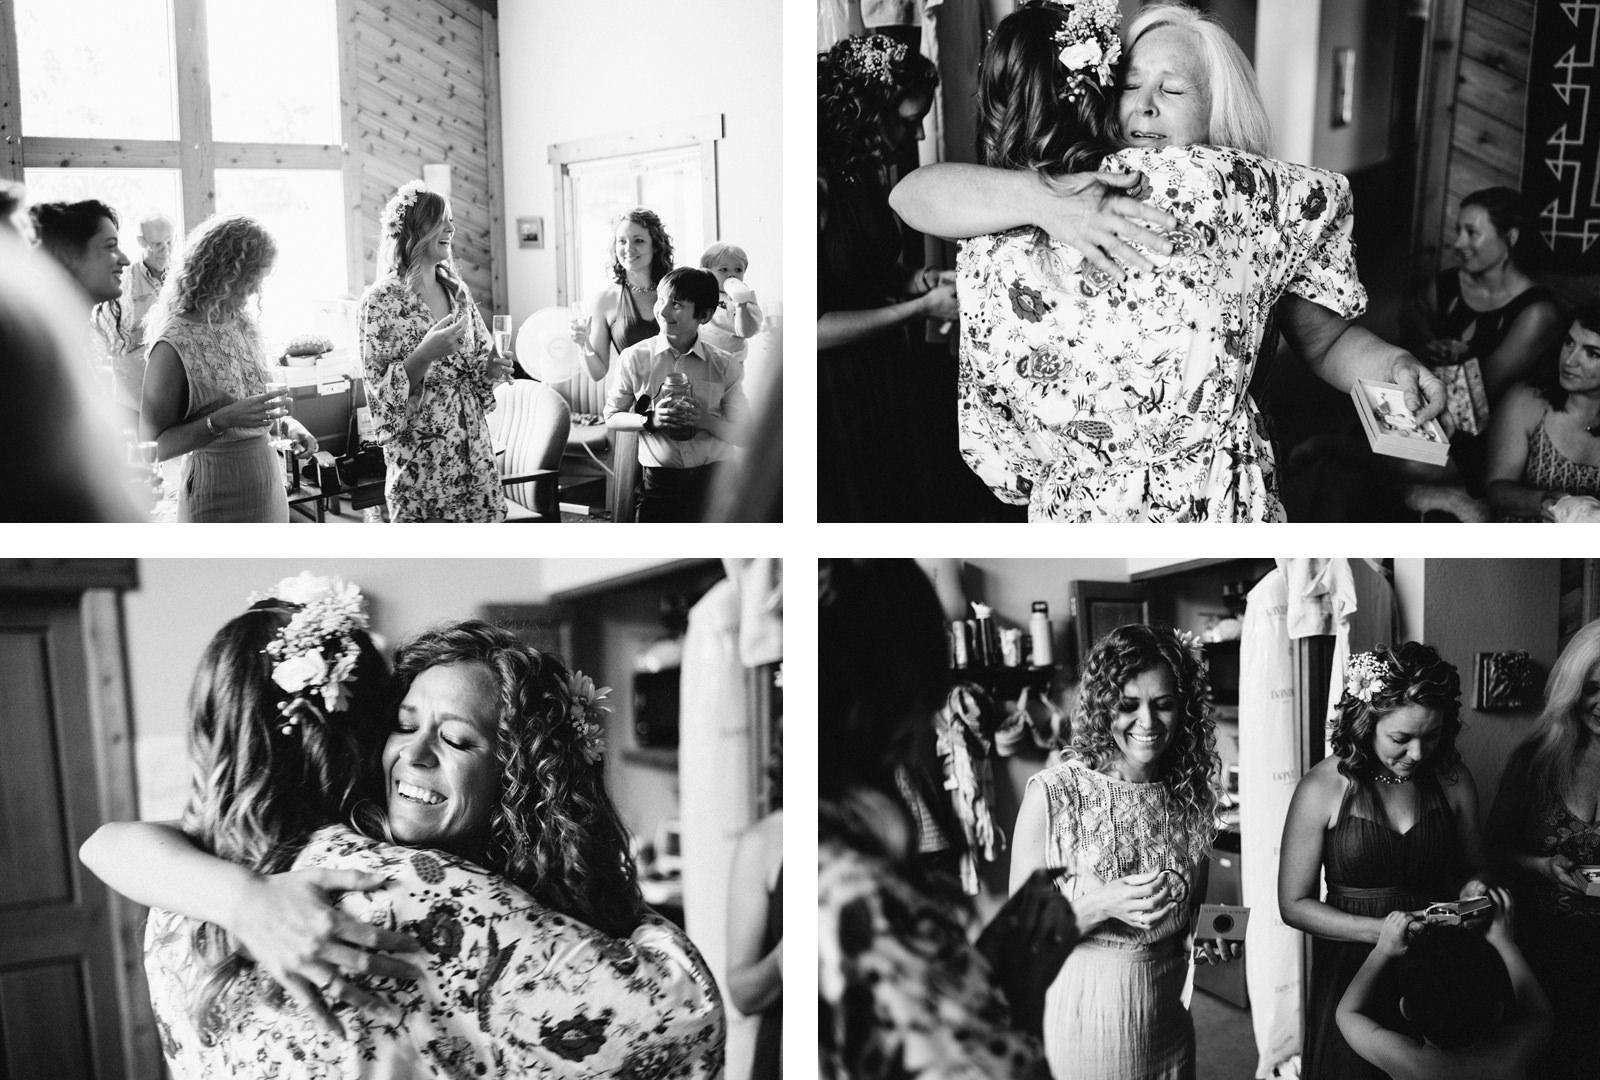 rivers-bend-retreat-wedding-005 RIVER'S BEND RETREAT WEDDING